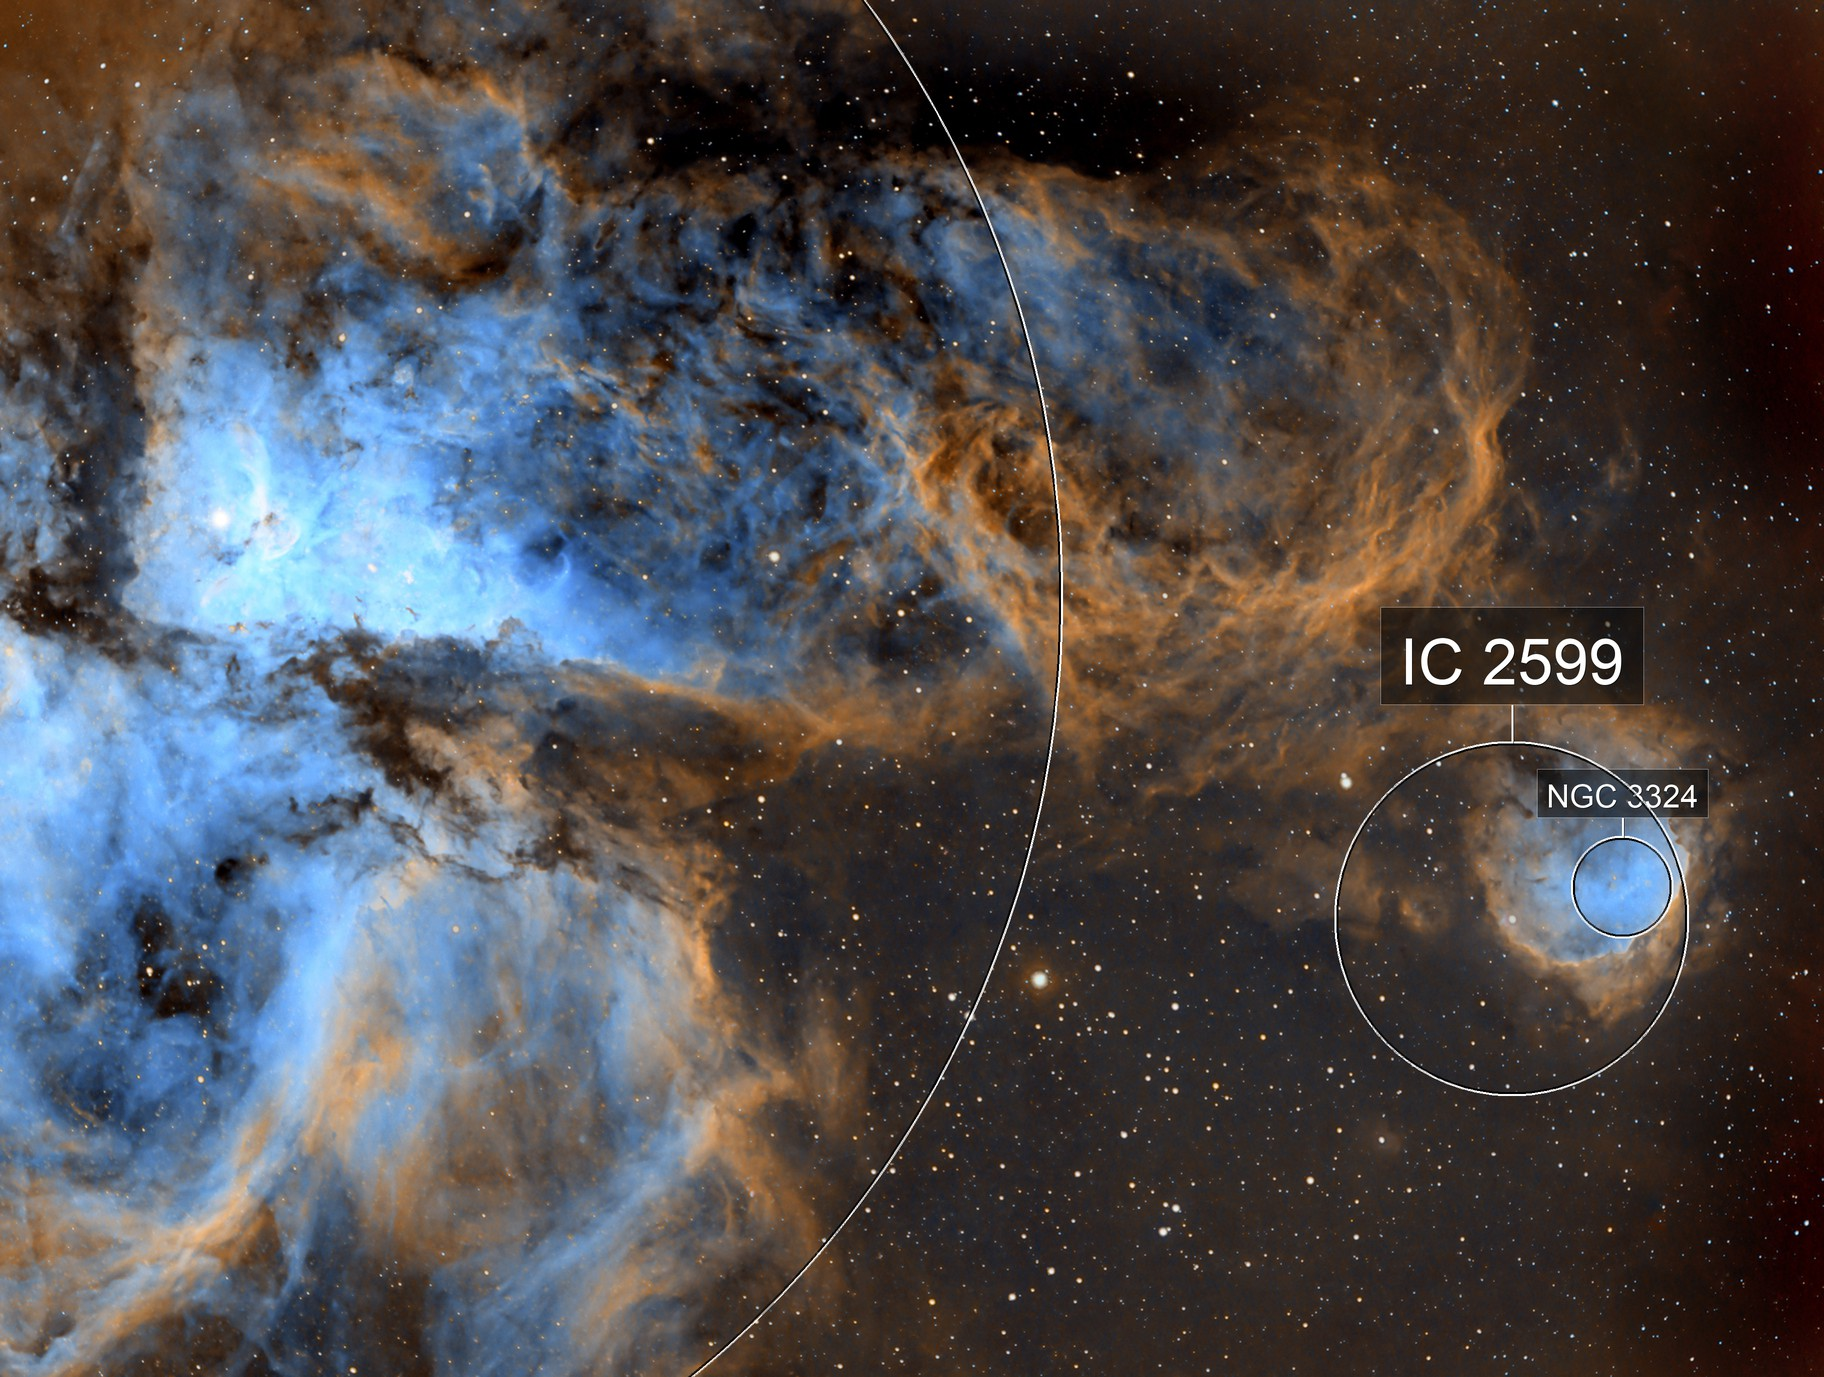 NGC 3324 GABRIELA MISTRAL